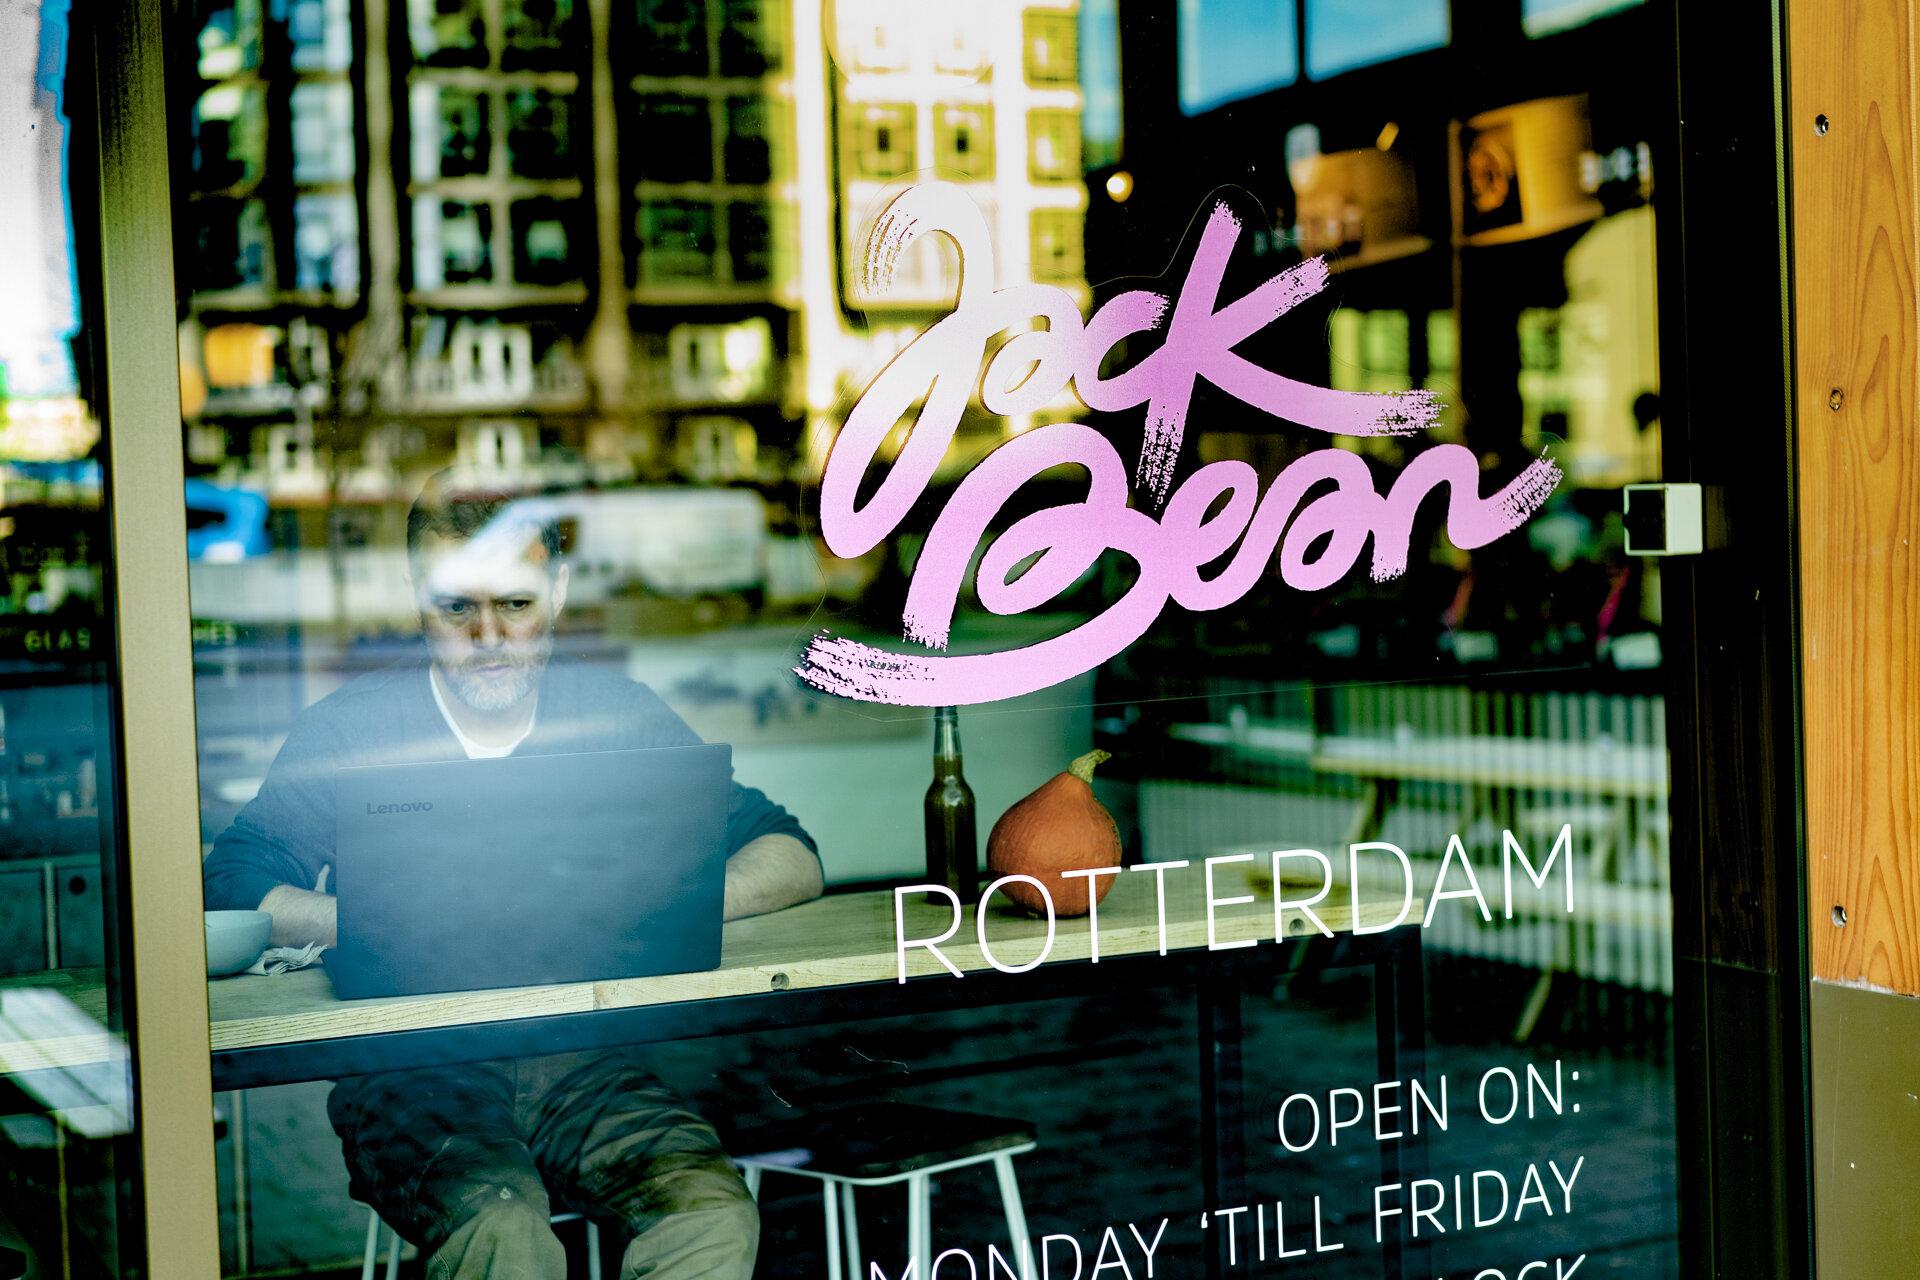 JackBean Rotterdam